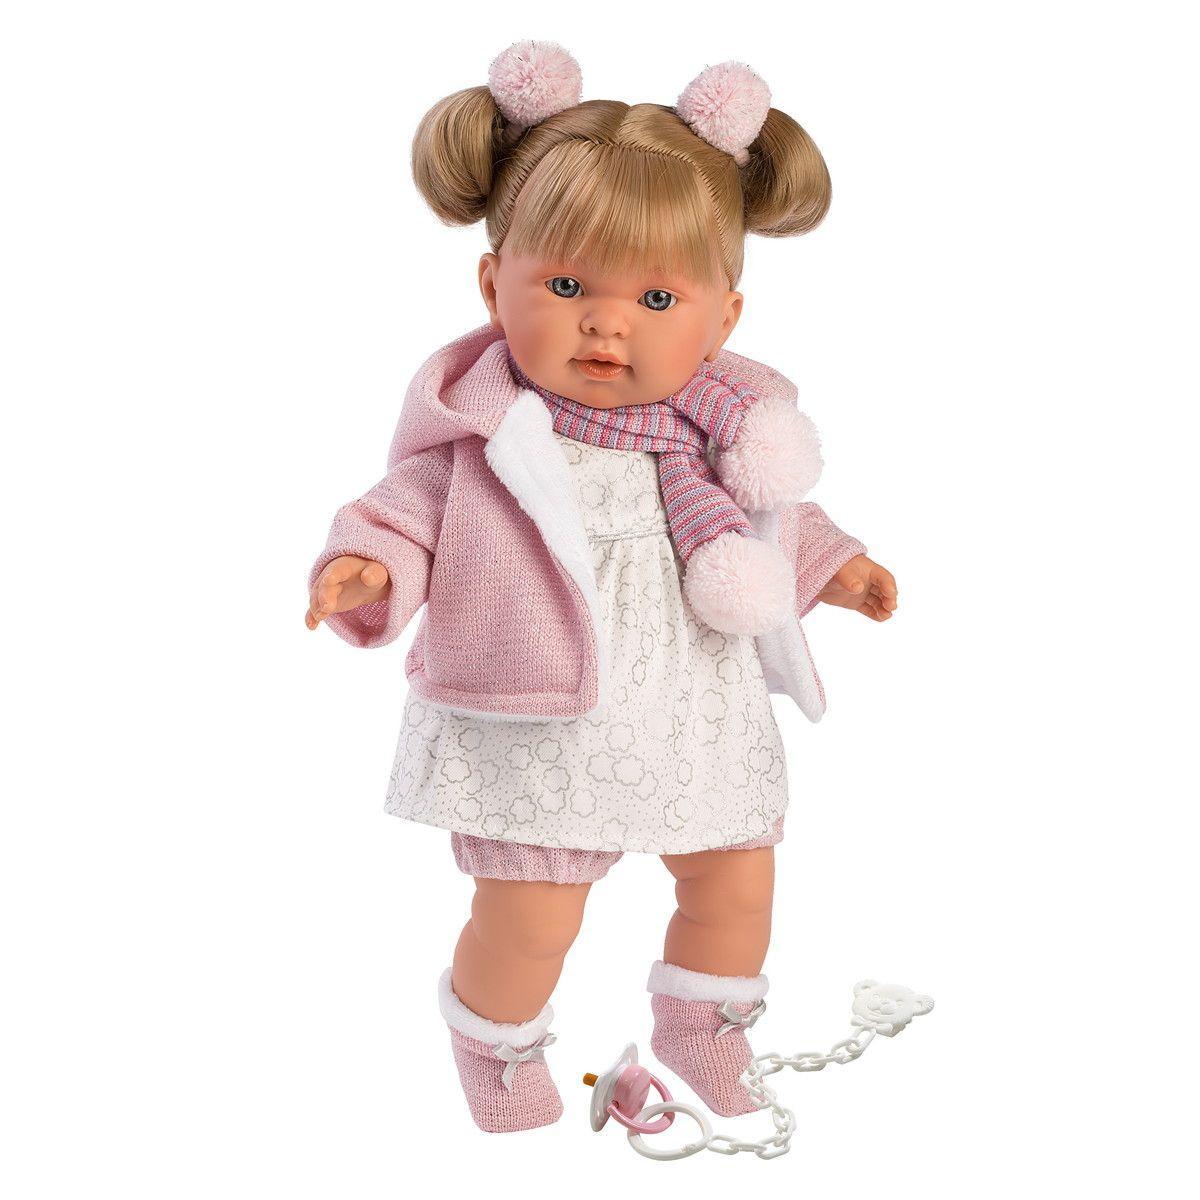 Интерактивная плачущая кукла, 42 см, Александра, Llorens 42262